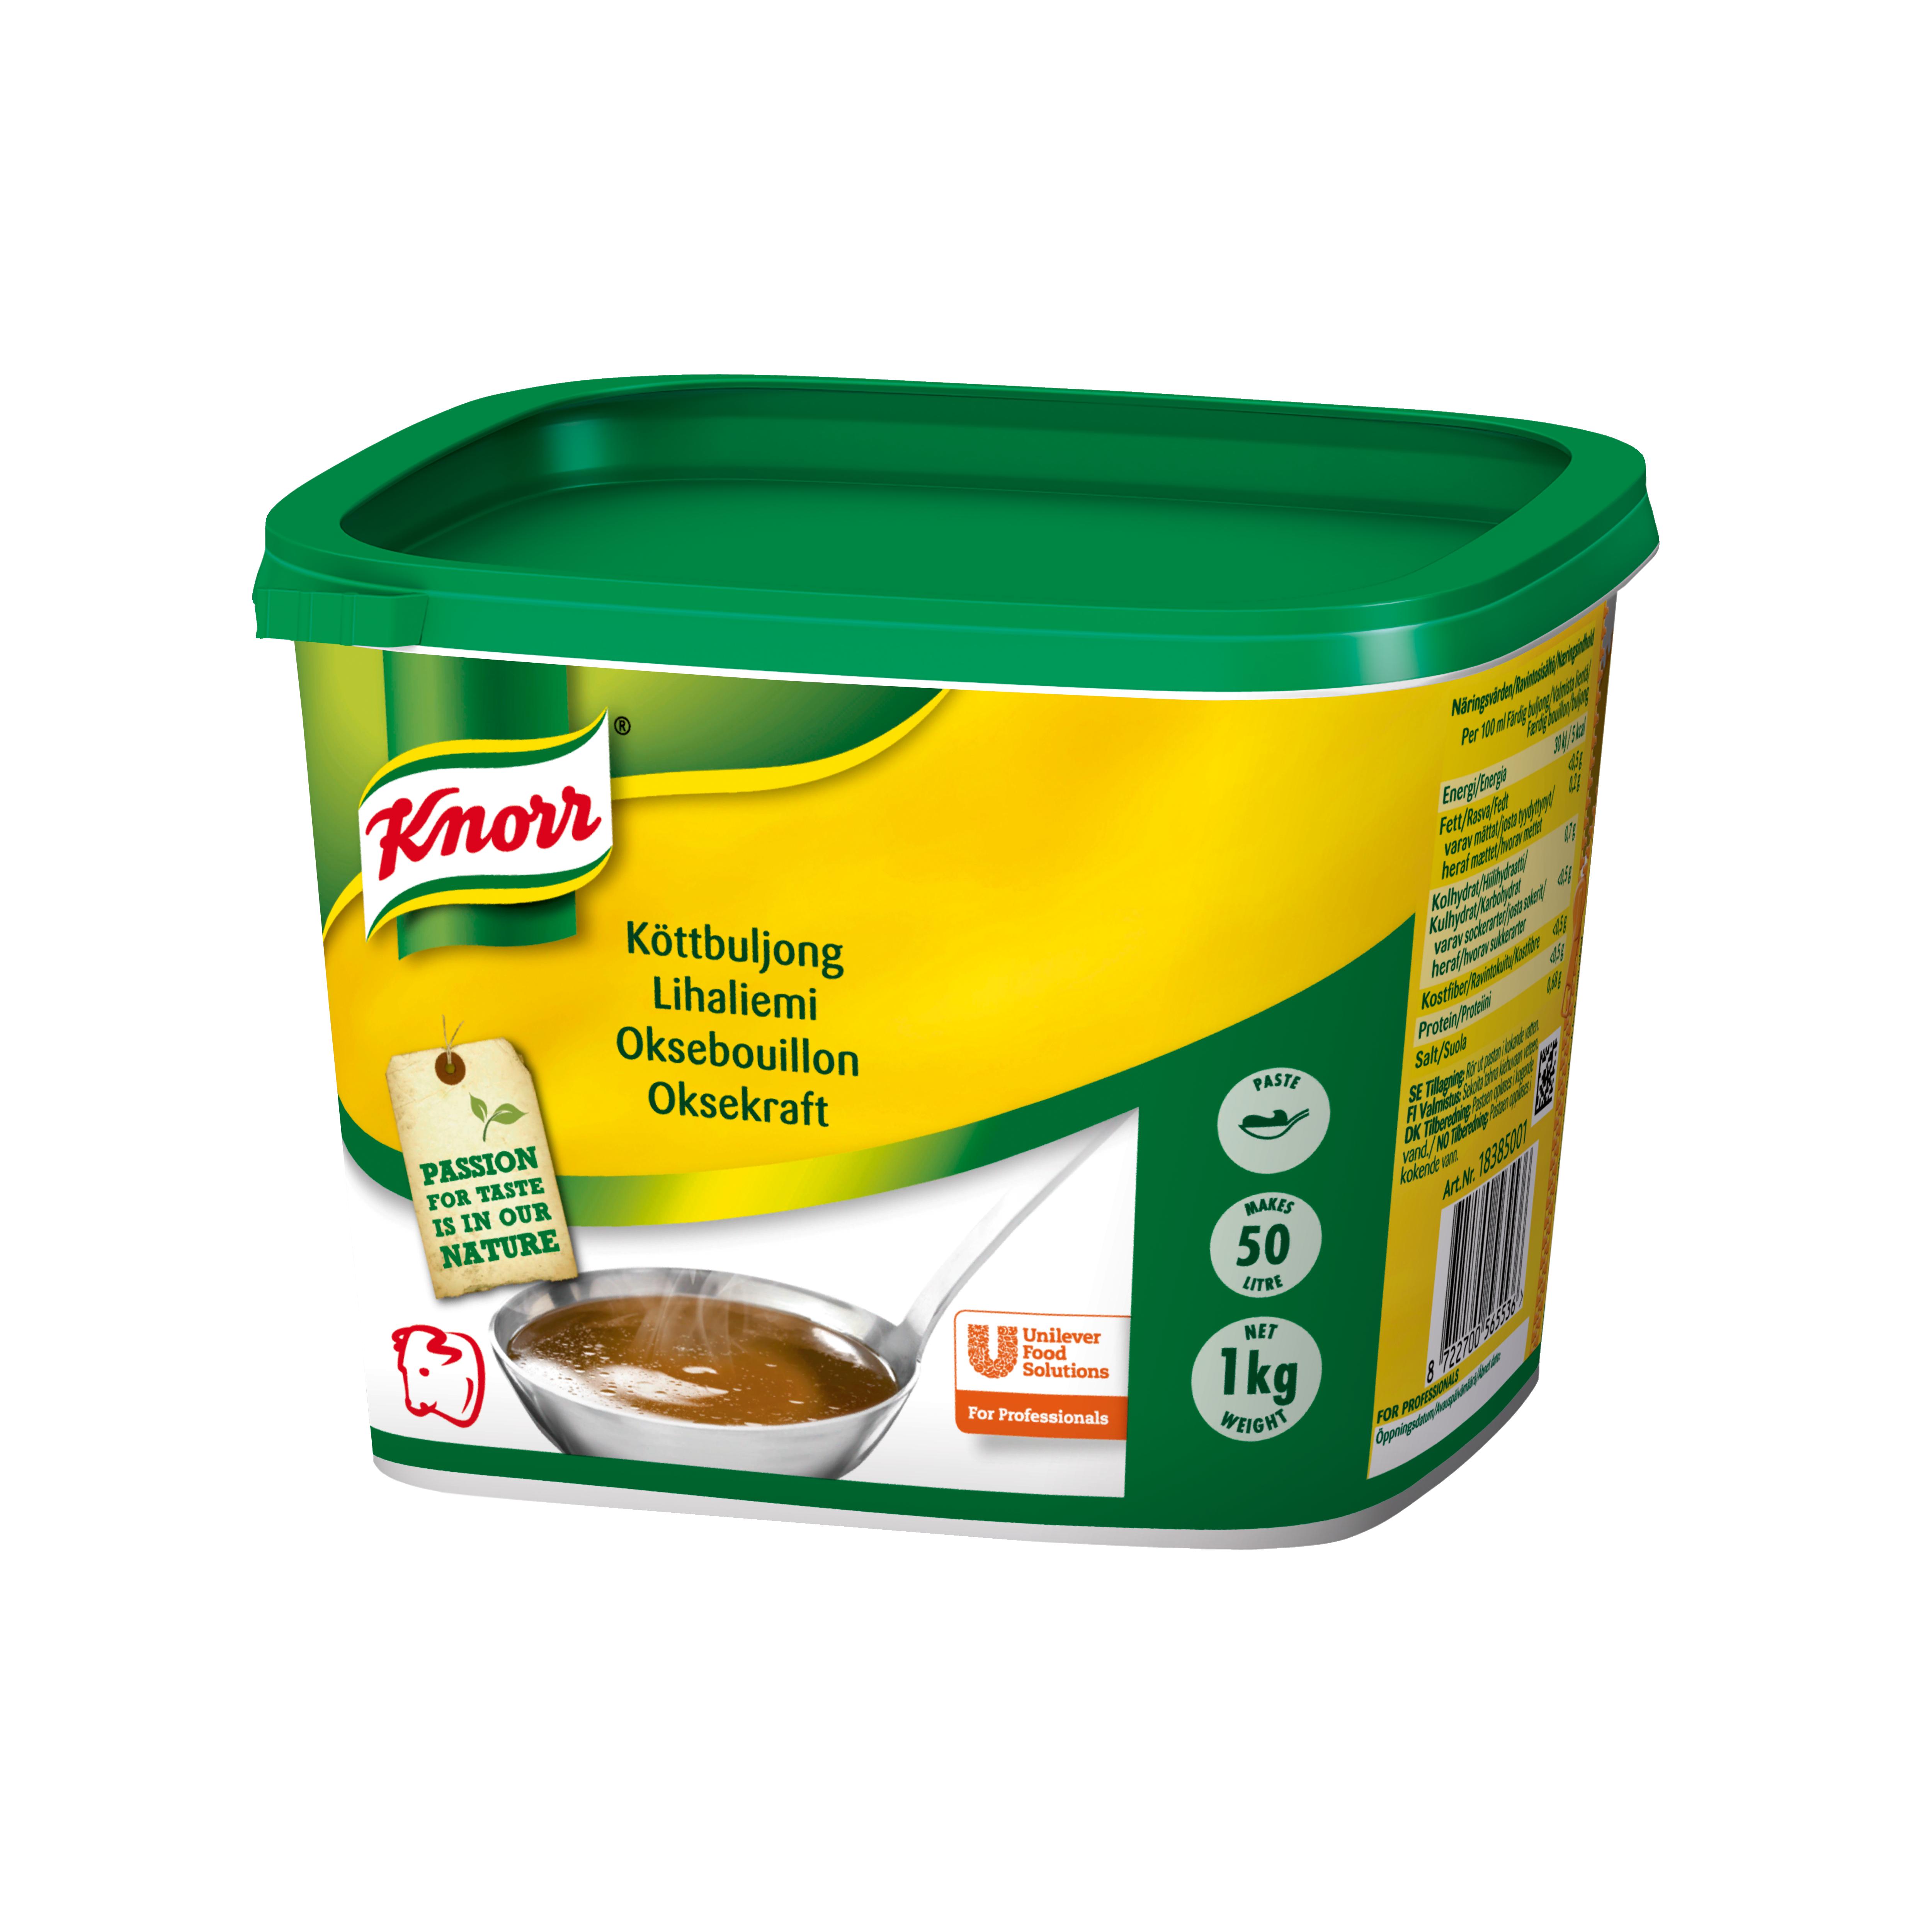 Knorr Oksebouillon, pasta 1 kg / 50 L